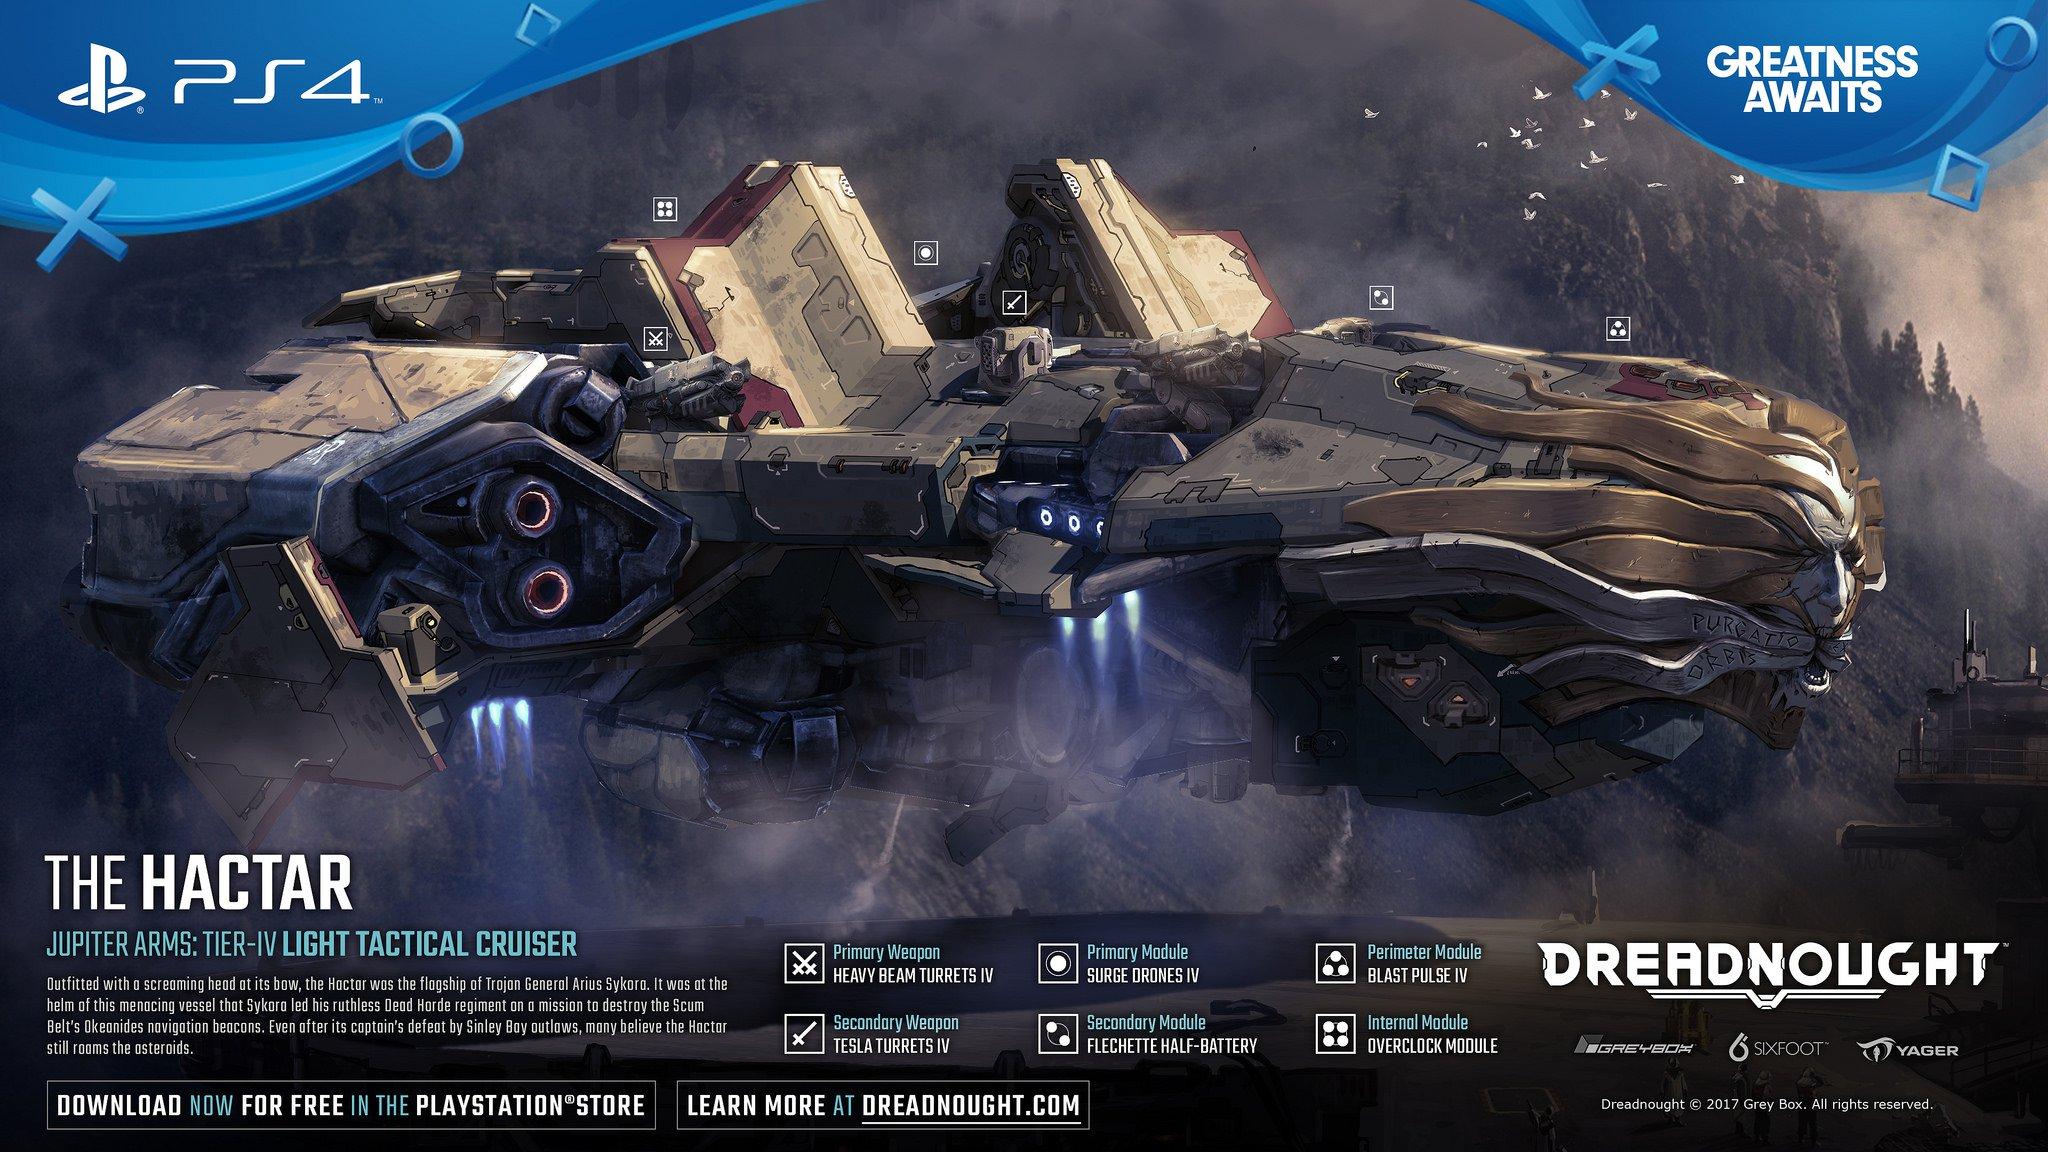 la-beta-abierta-dreadnought-ya-esta-disponible-playstation-4-frikigamers.com